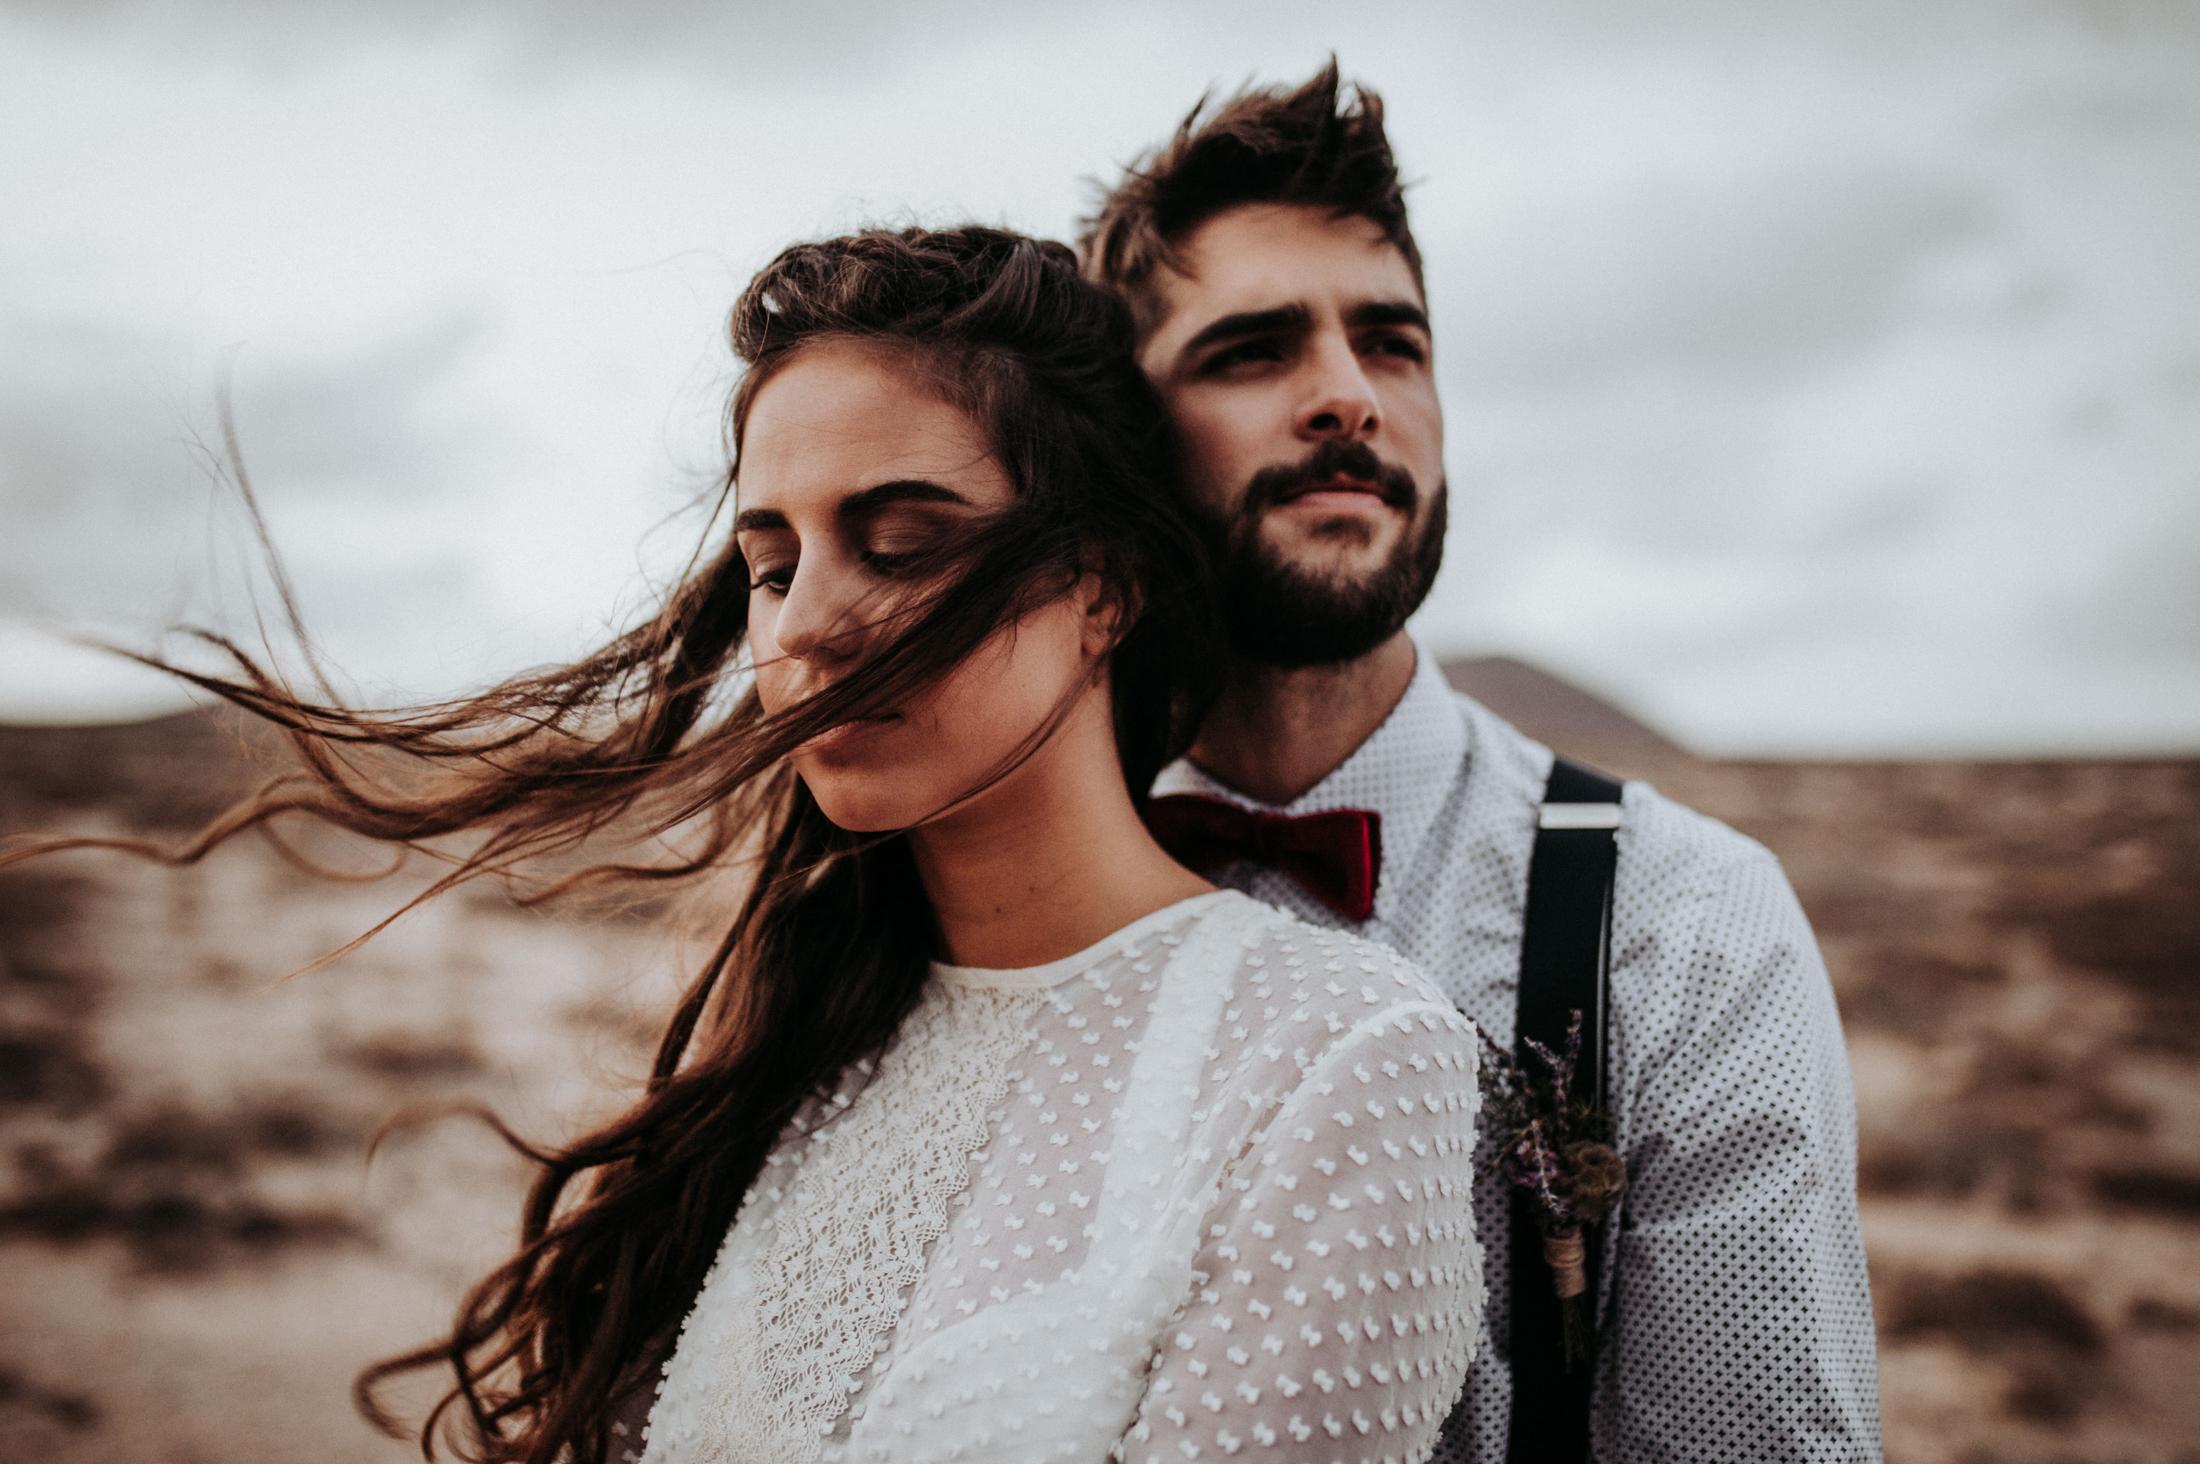 Wedding_Photographer_Mallorca_Daniela-Marquardt_Photography_CanaryIslands_Lanzarote_Iceland_Tuskany_Santorini_Portugal_Schweiz_Austria_Bayern_Elopement_Hochzeitsfotograf_35